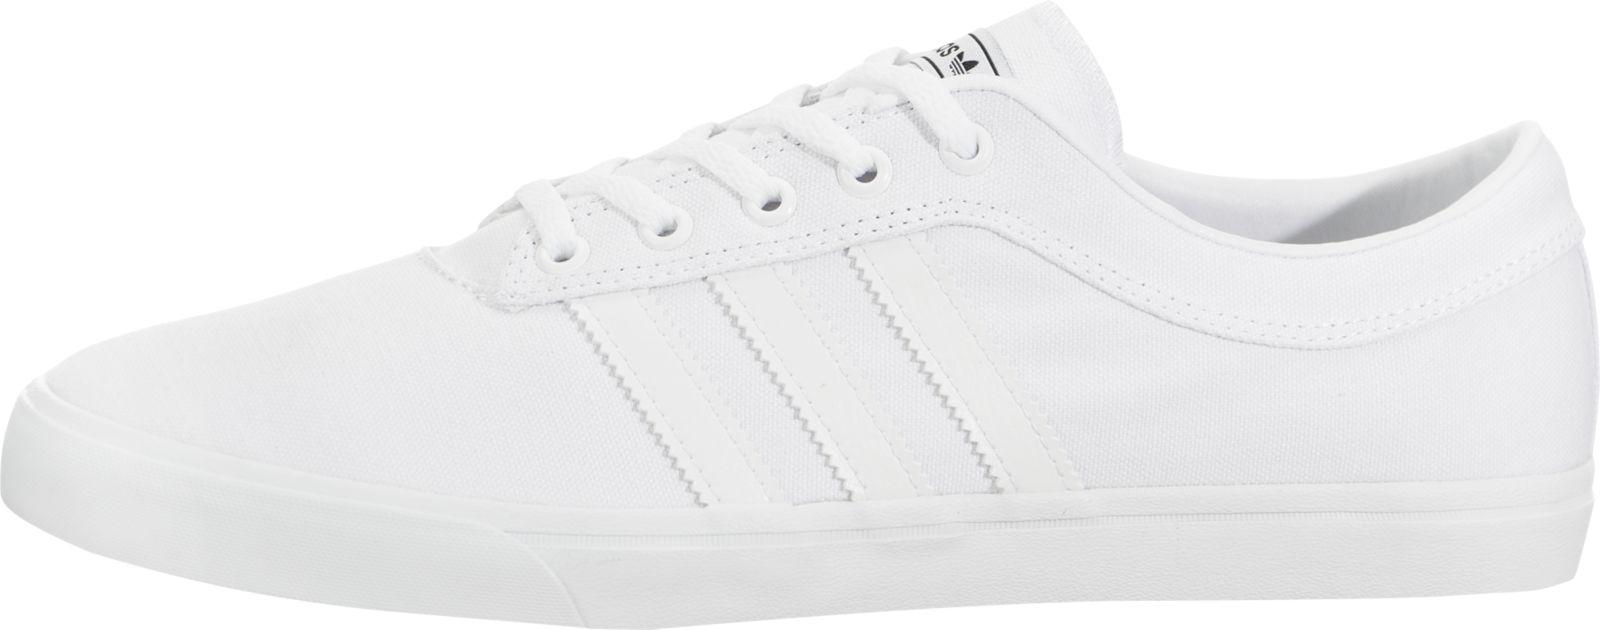 adidas originali bianco sellwood pattinare scarpe mens scarpe bb8691 11